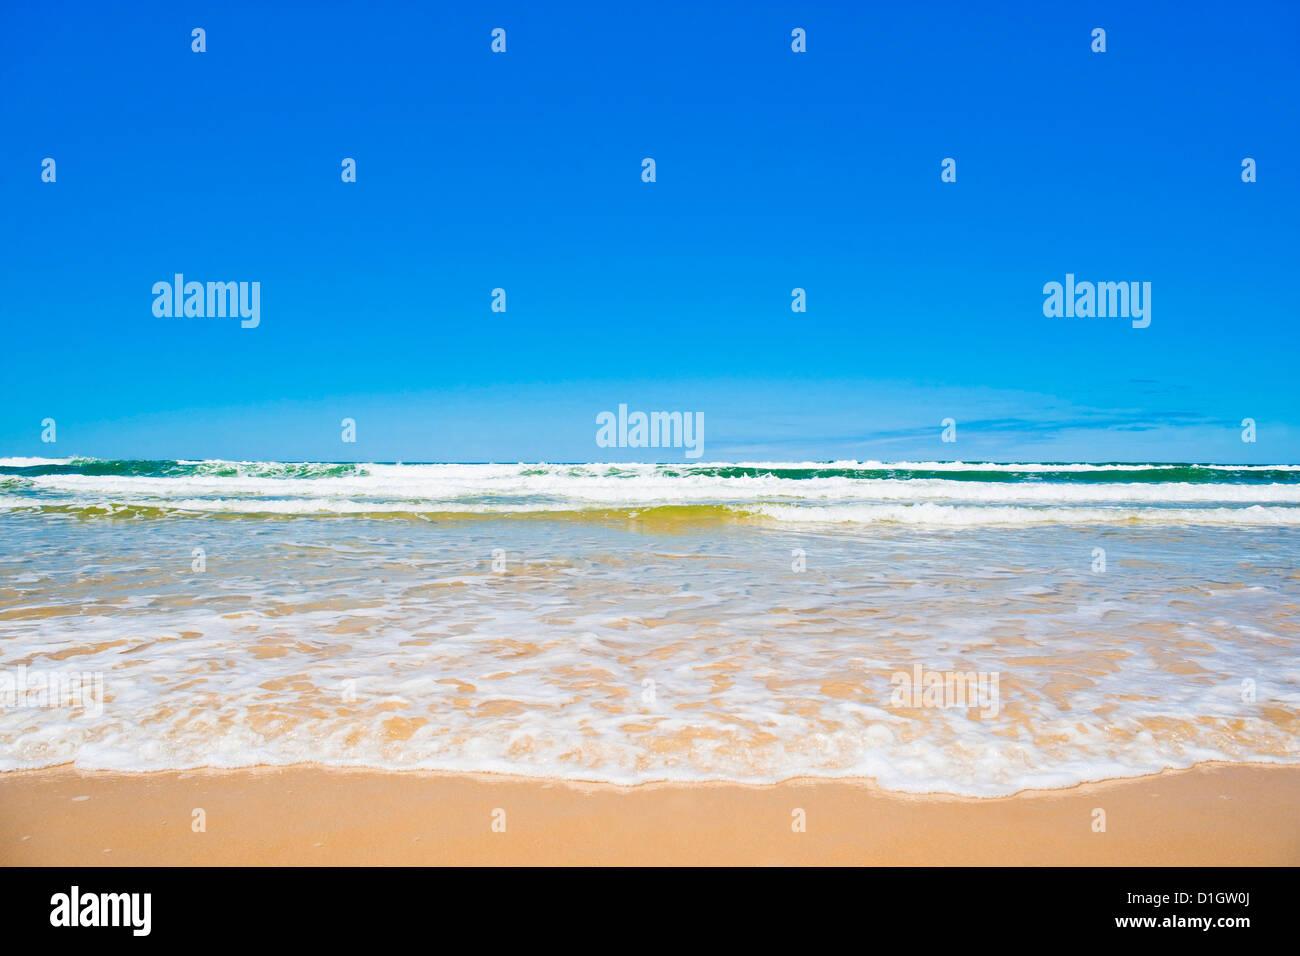 Sand sea and sky of Seventy Five Mile Beach, Fraser Island, UNESCO World Heritage Site, Queensland, Australia, Pacific - Stock Image